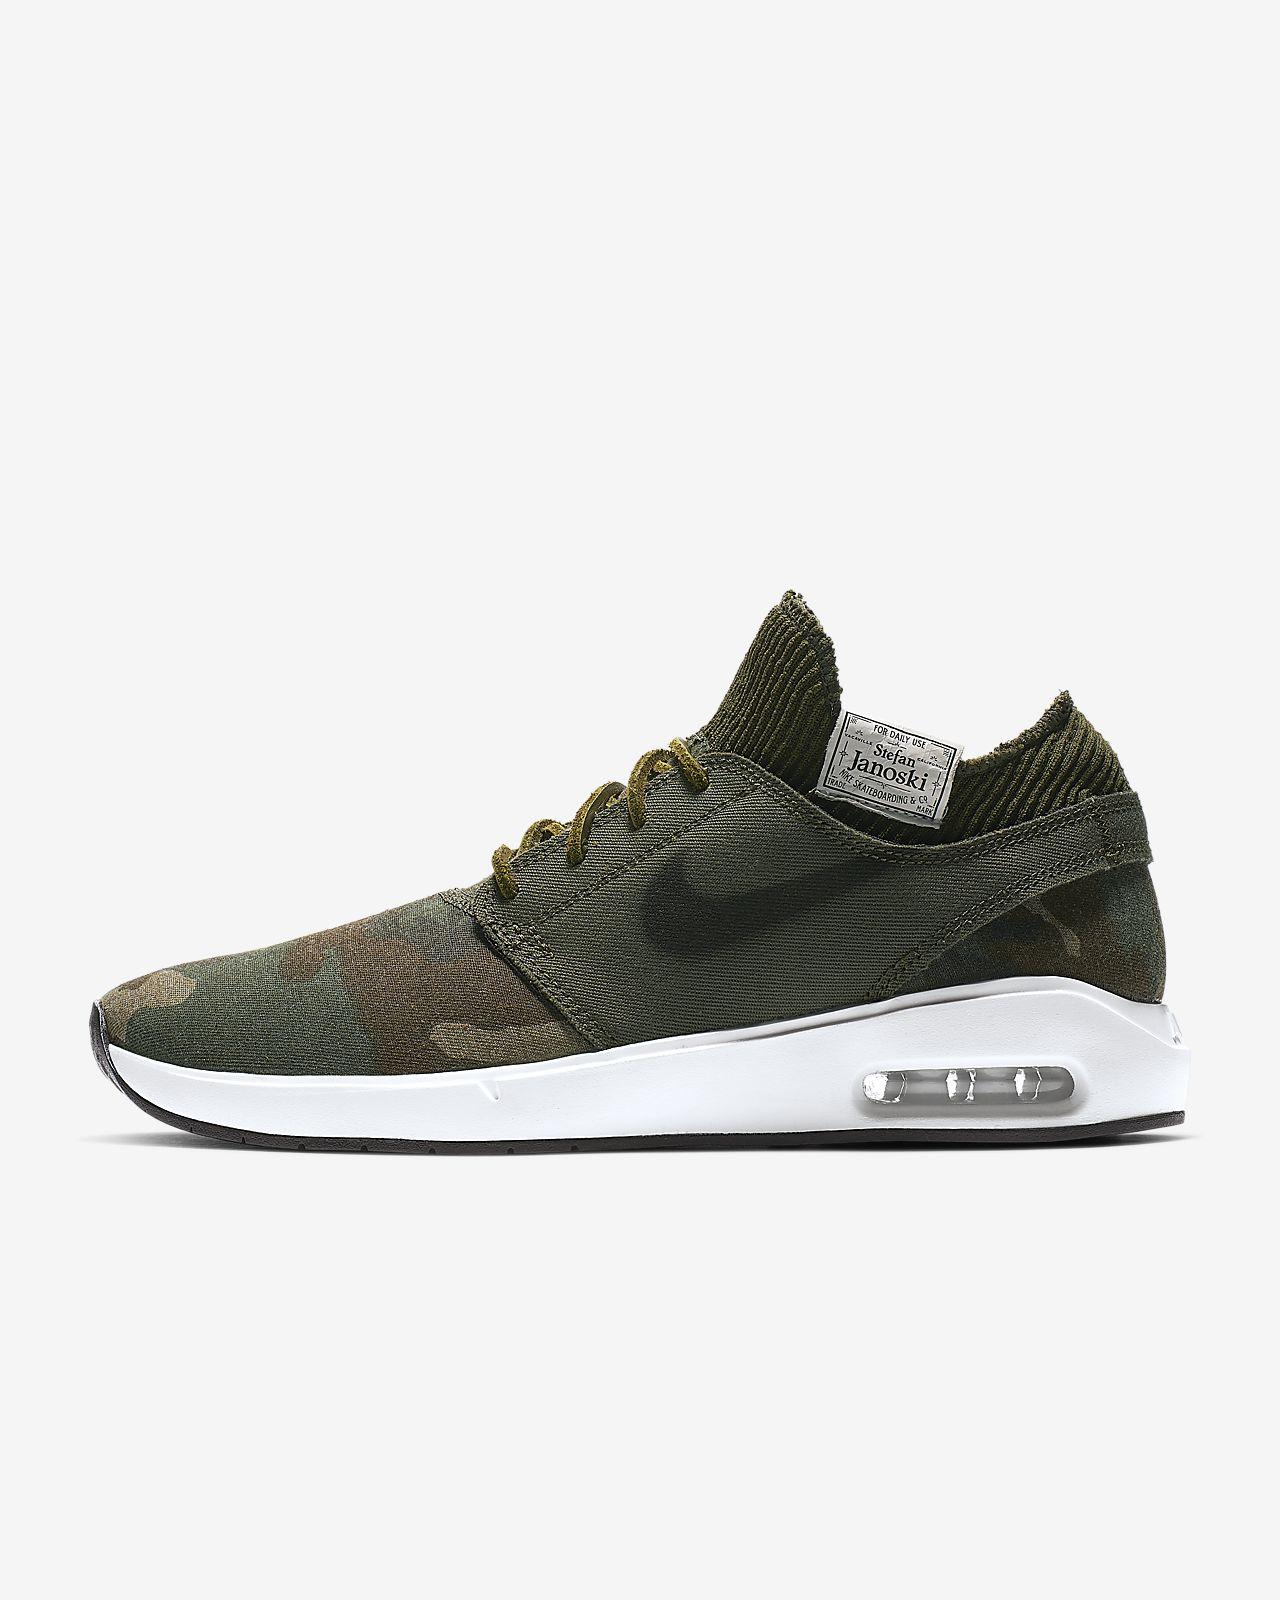 eb4ebabd2a Nike SB Air Max Stefan Janoski 2 Premium Men's Skate Shoe. Nike.com